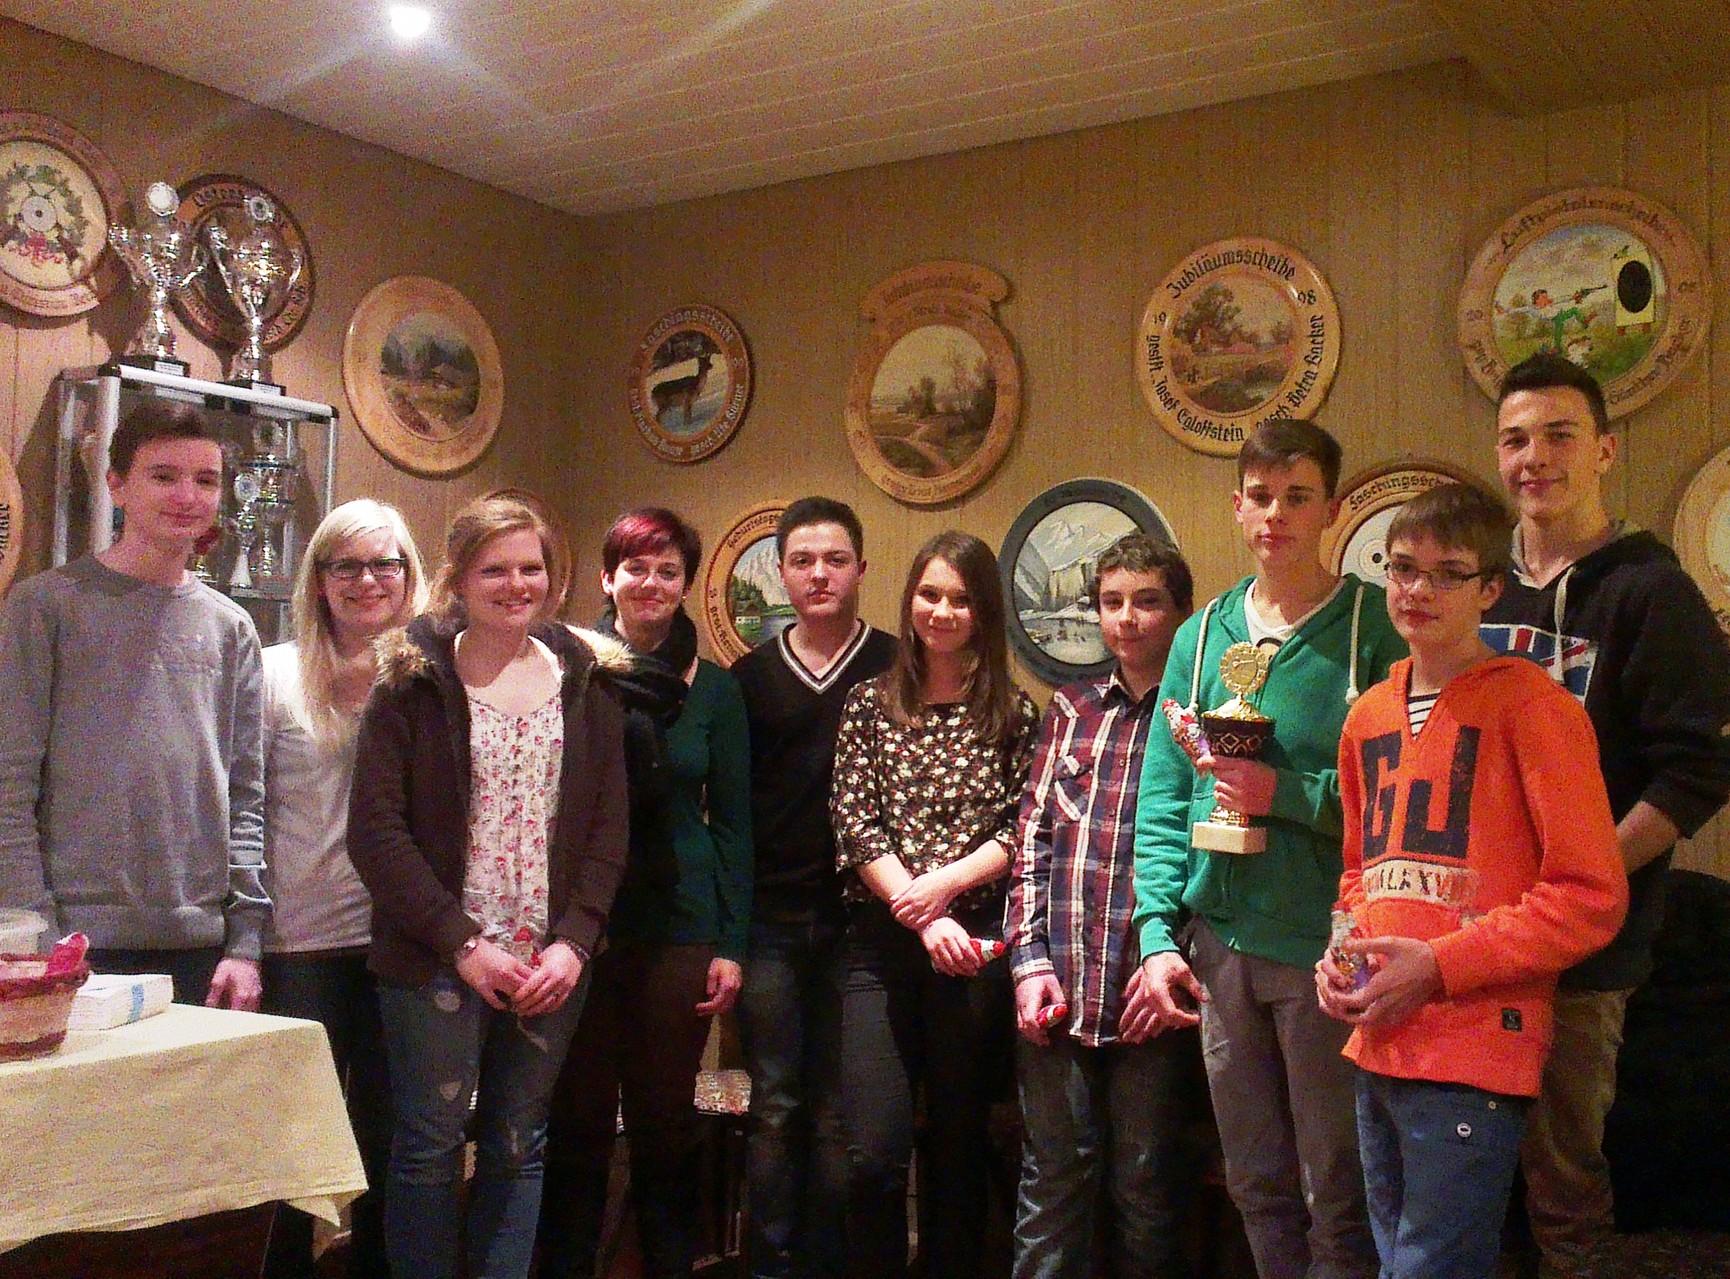 Jugend-Weihnacht-Pokal 2013                                      Gewonnen von Christian Rühlow